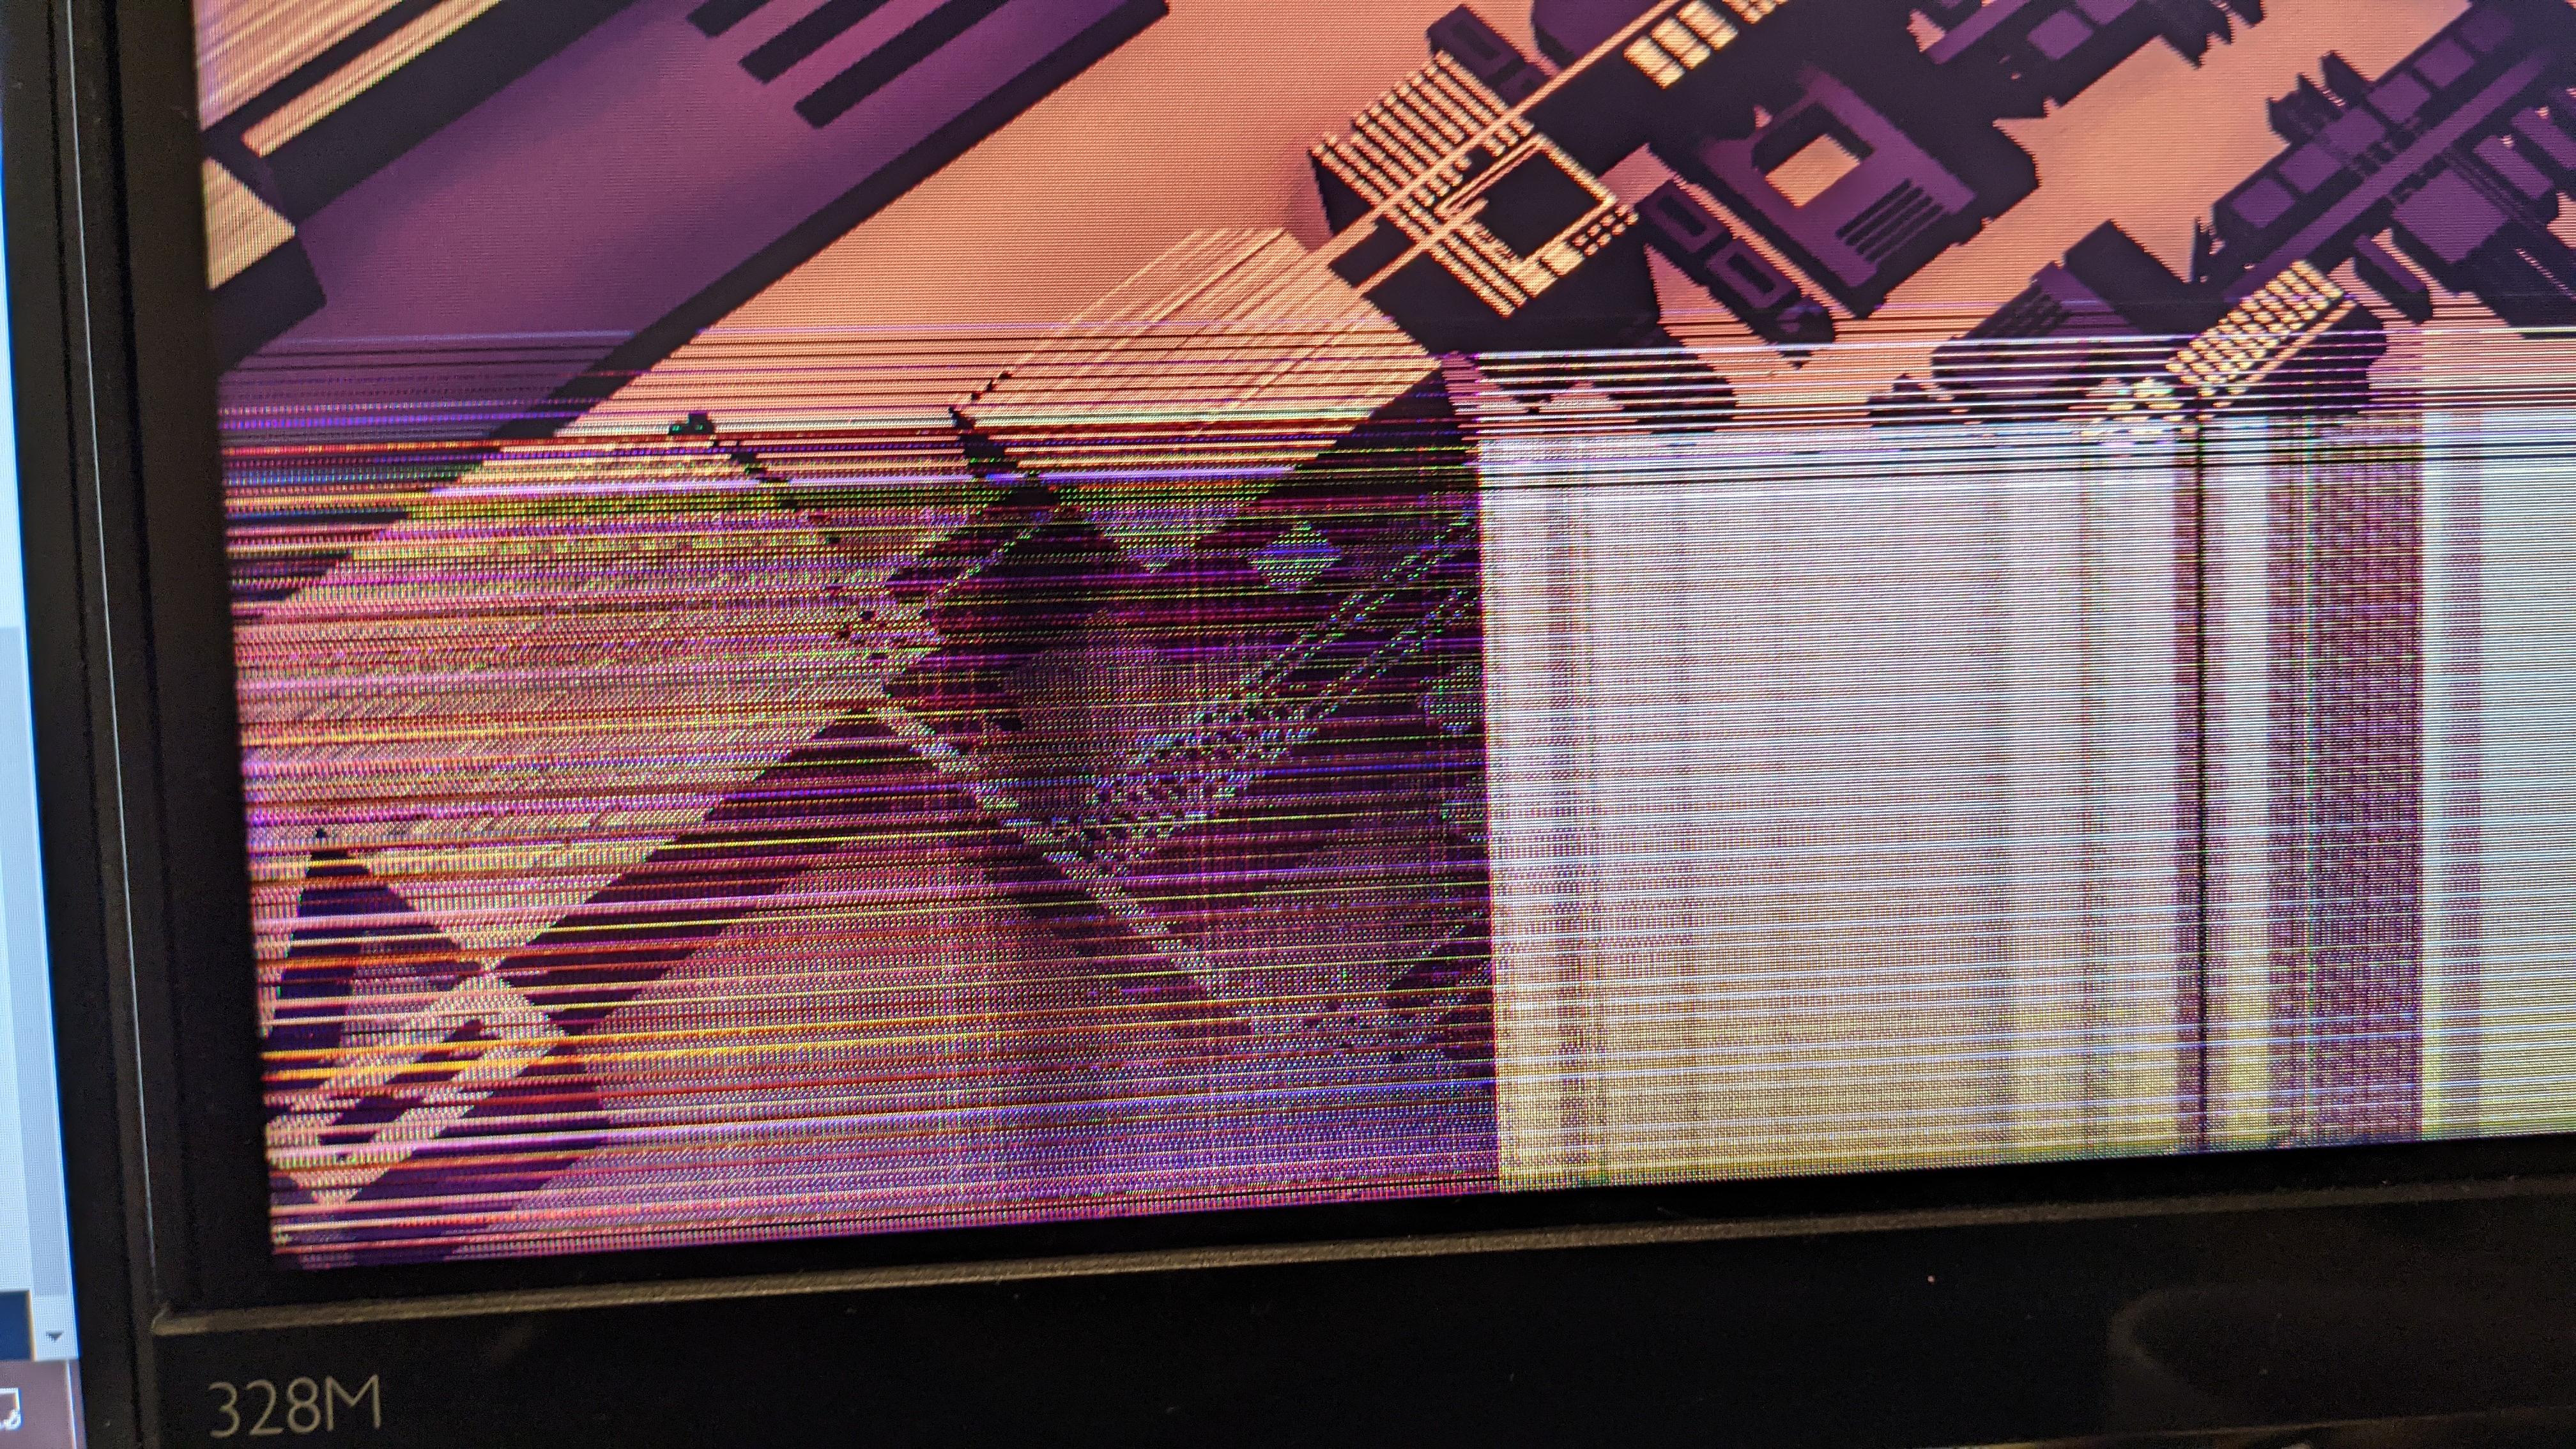 PXL_20210620_091021366.MP.jpg